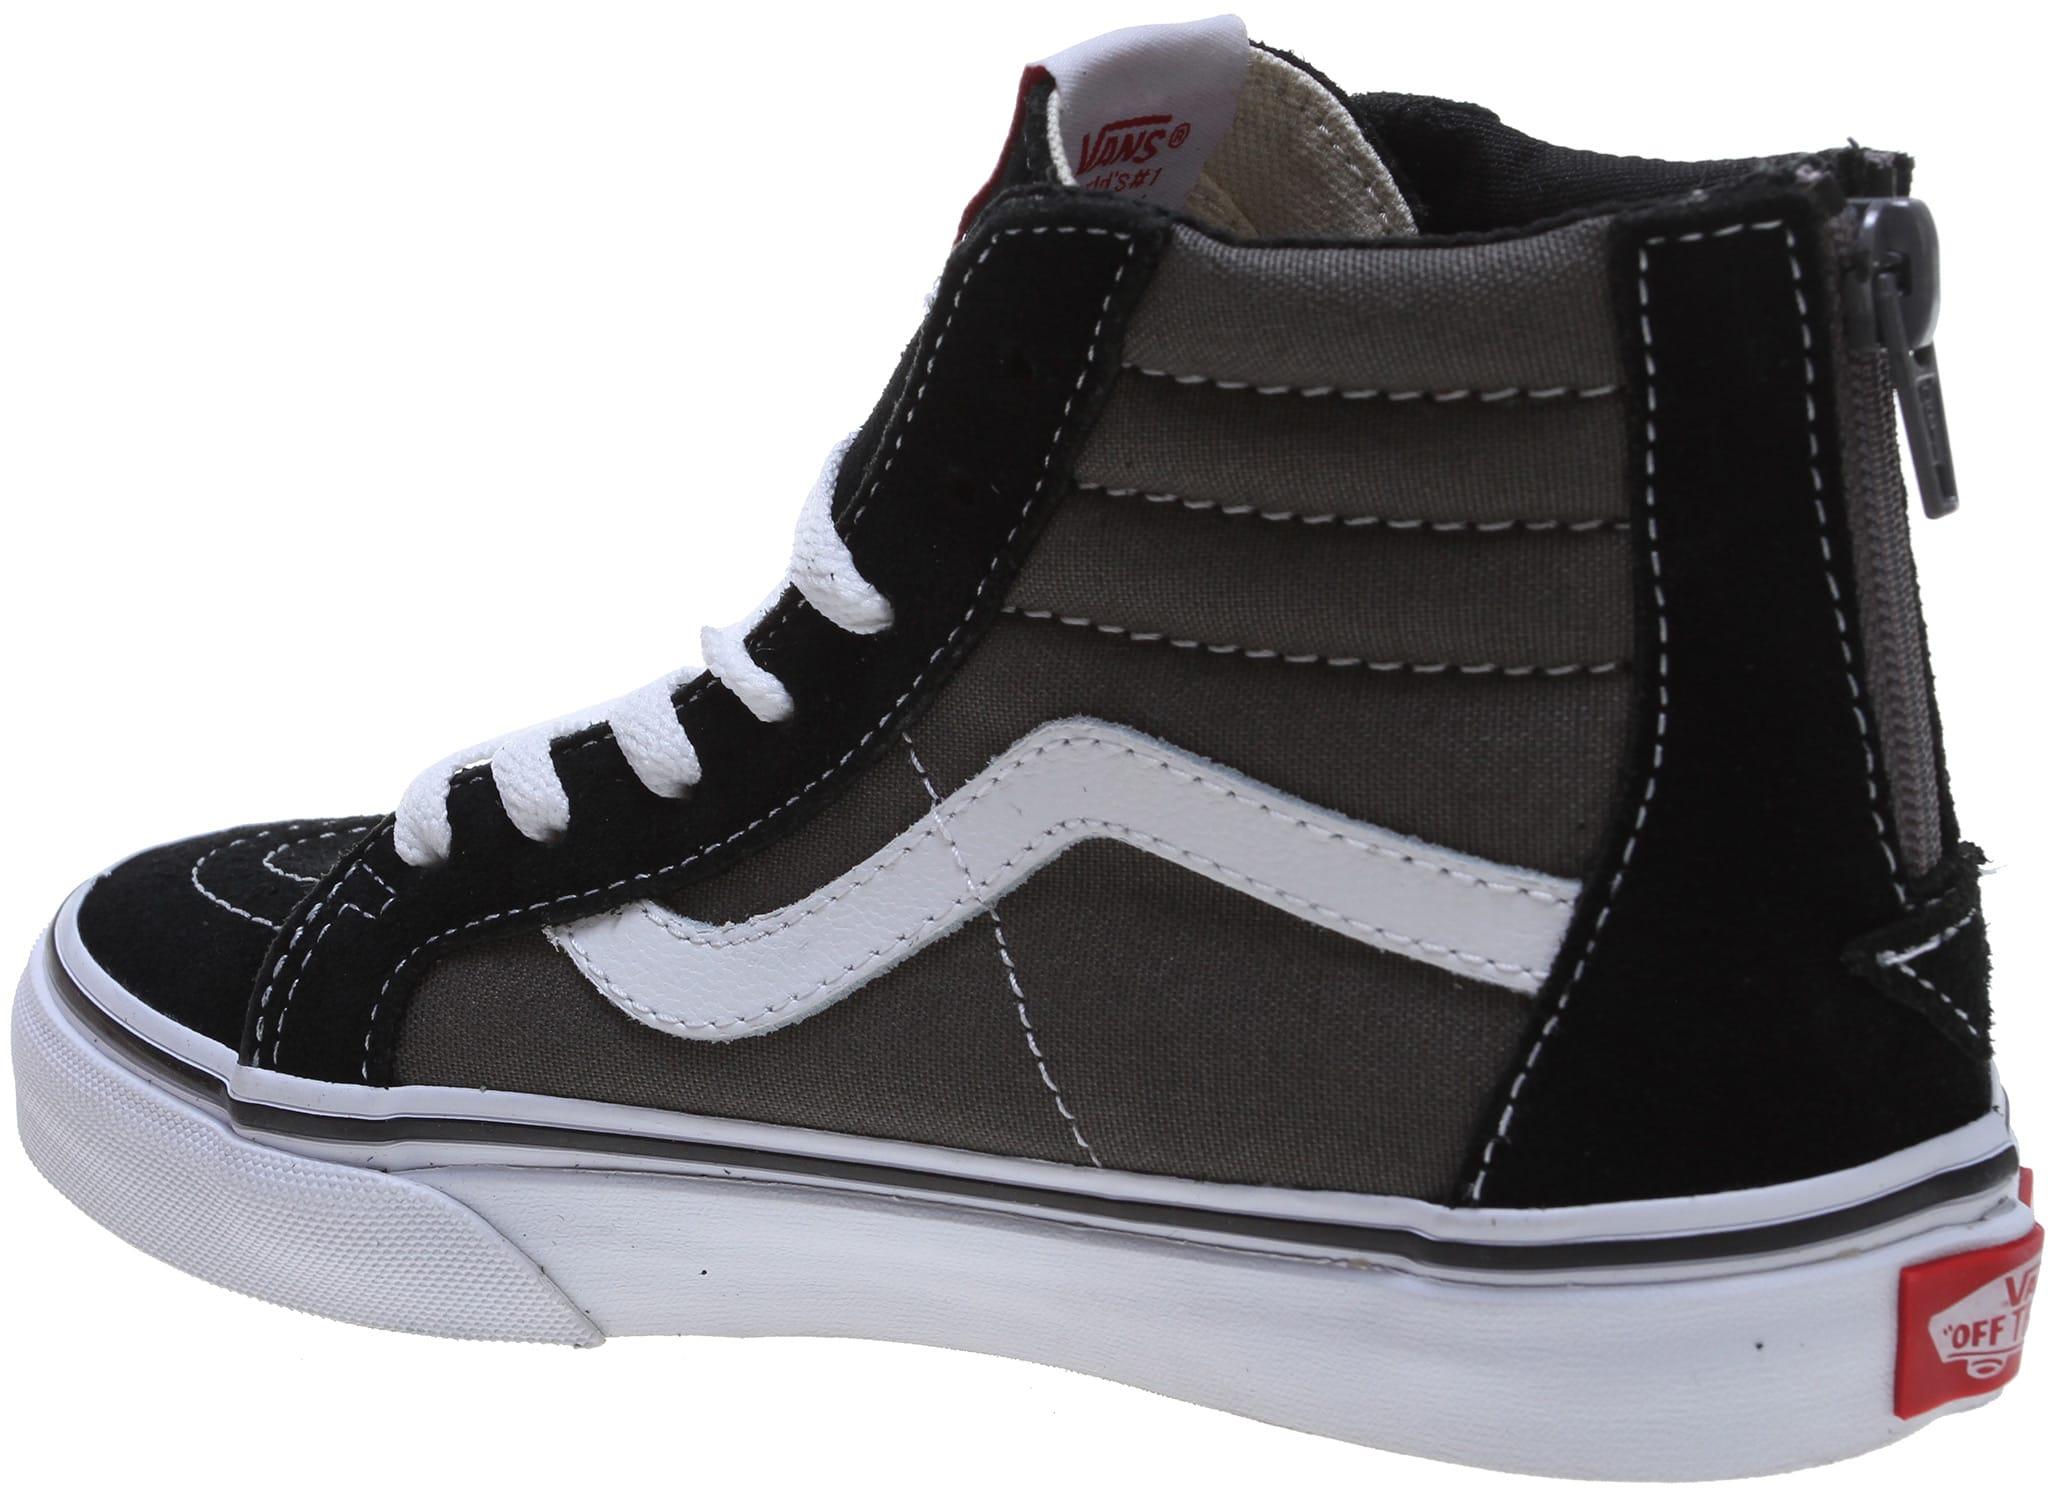 On Sale Vans Sk8-Hi Zip Skate Shoes - Kids, Youth up to 40% off